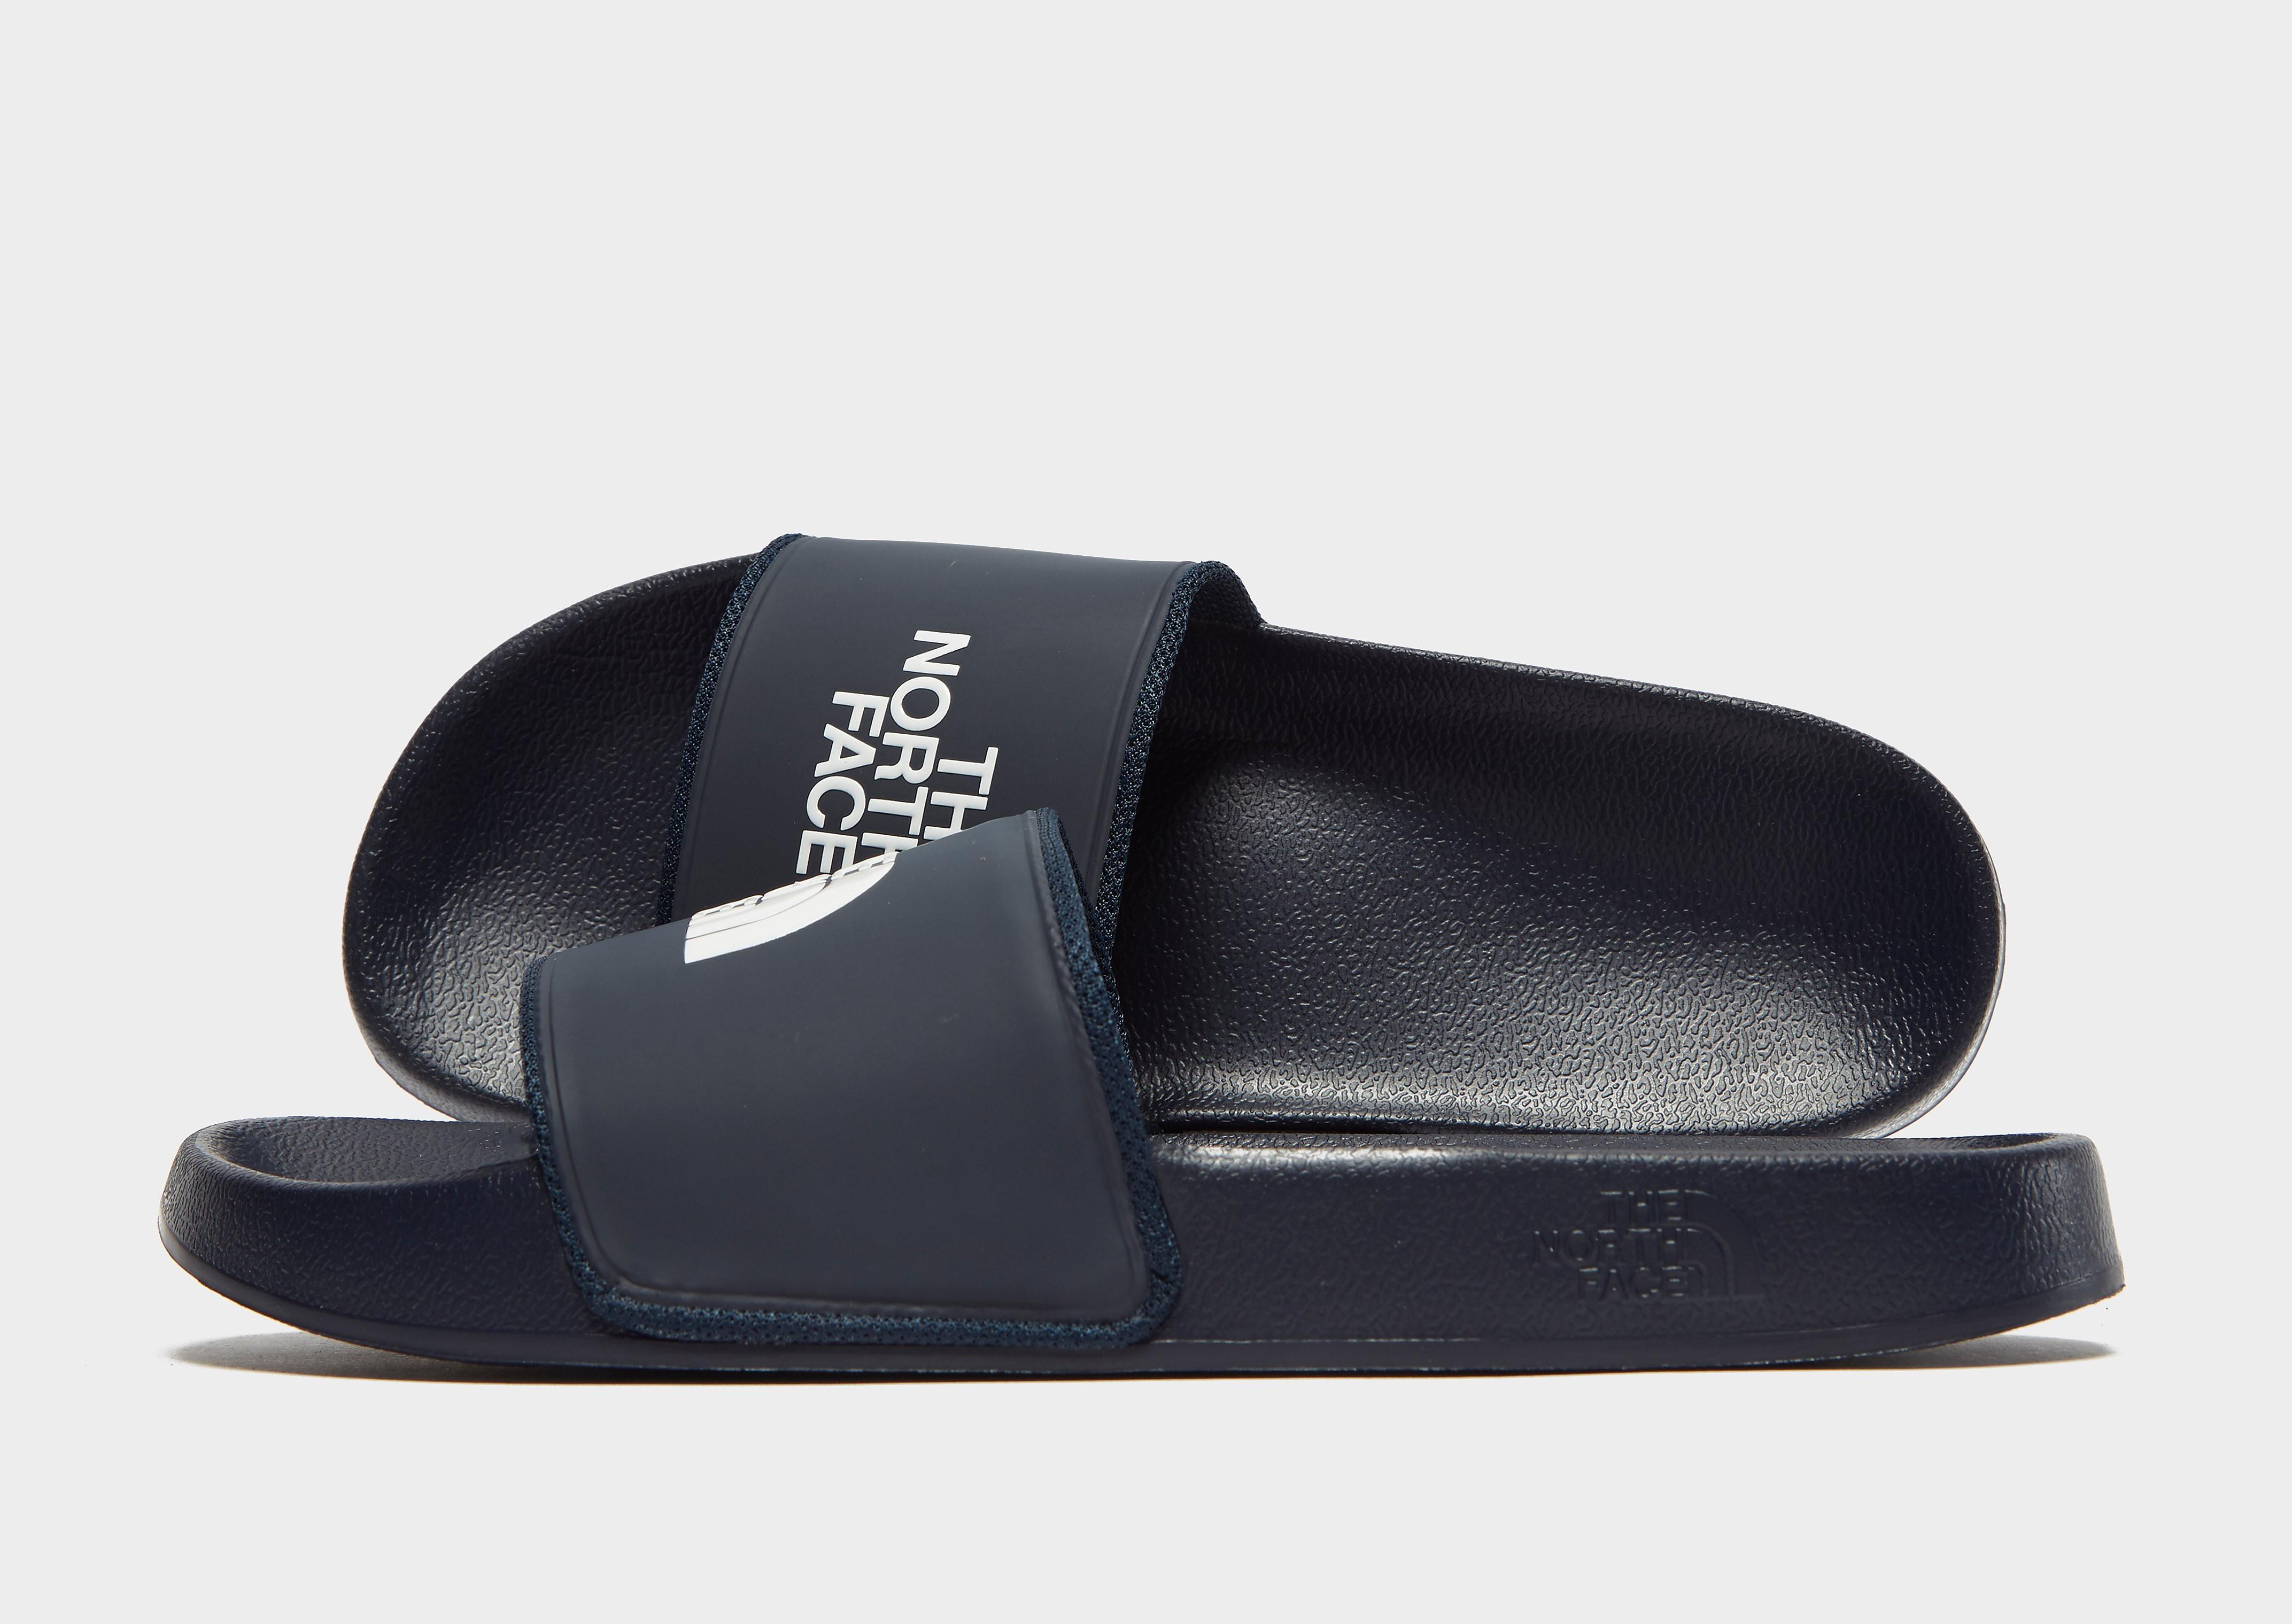 The North Face Slide Sandals